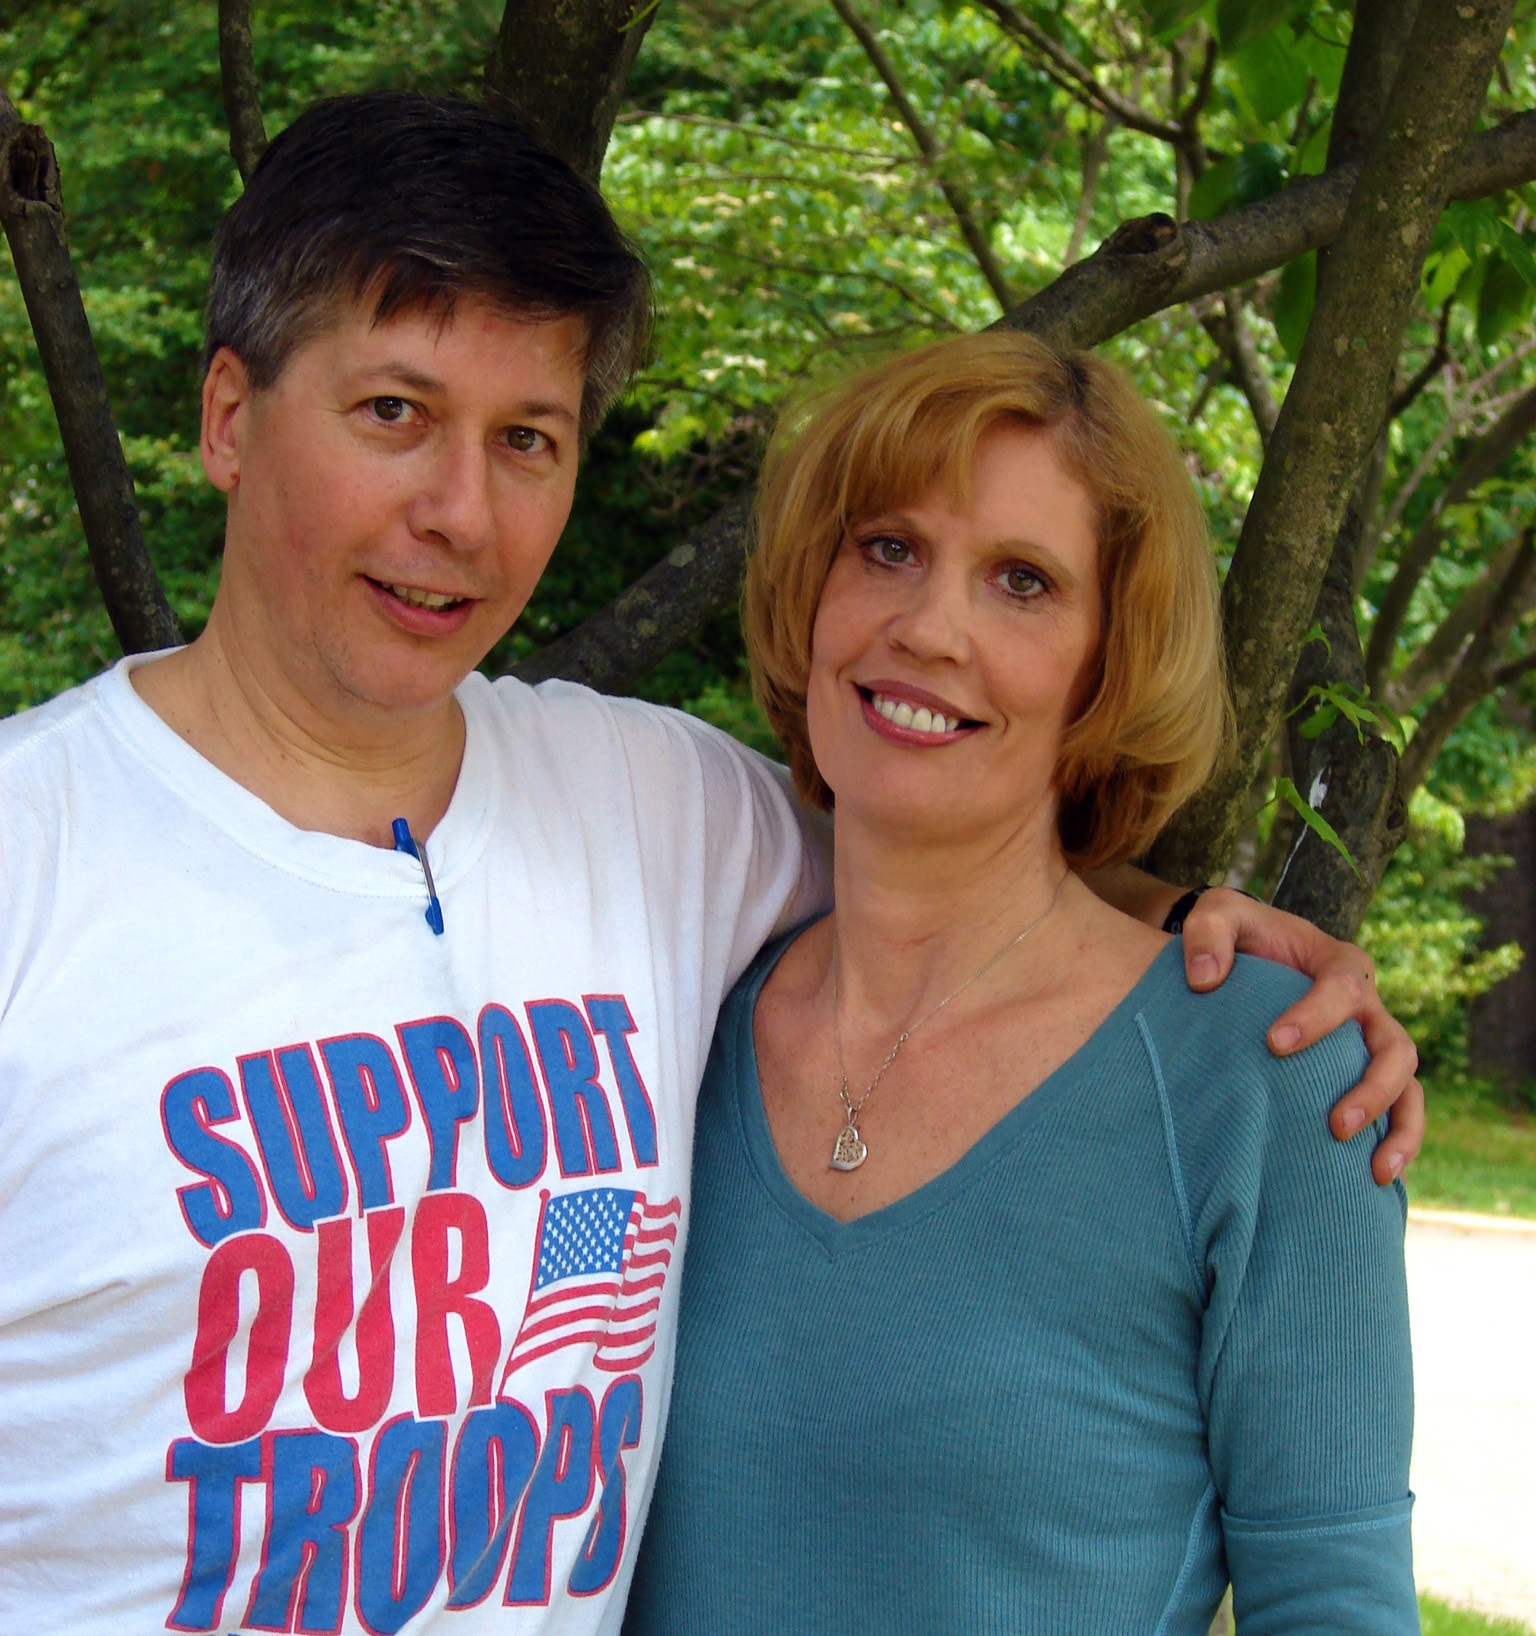 Ted+and+Brenda.jpg